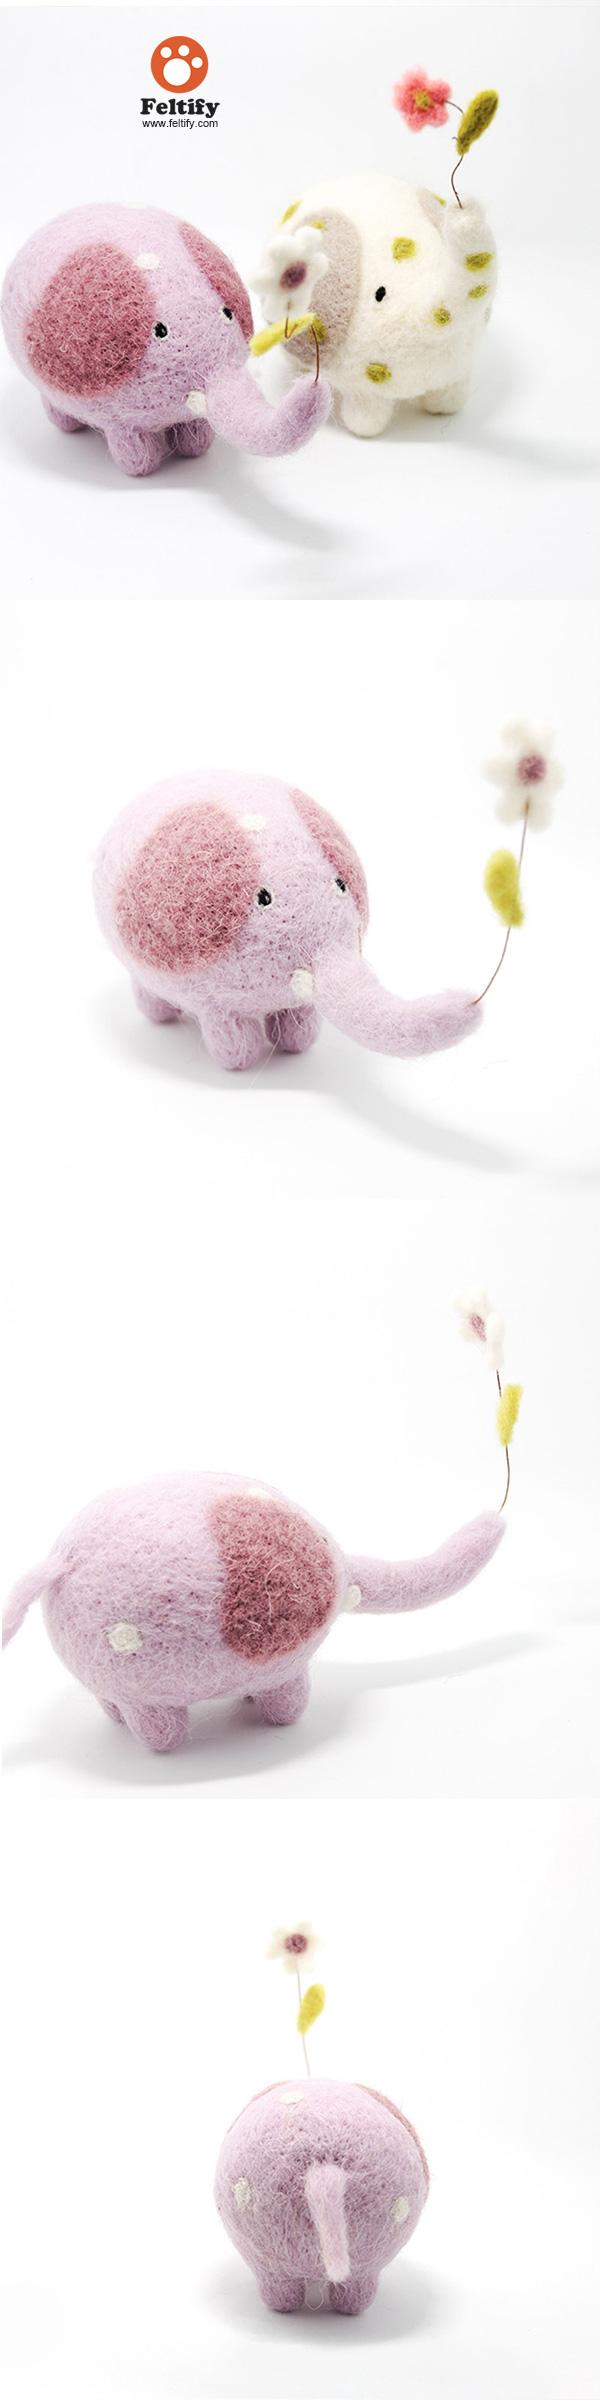 Needle Felted Felting Animals Elephants Flower Cute Craft